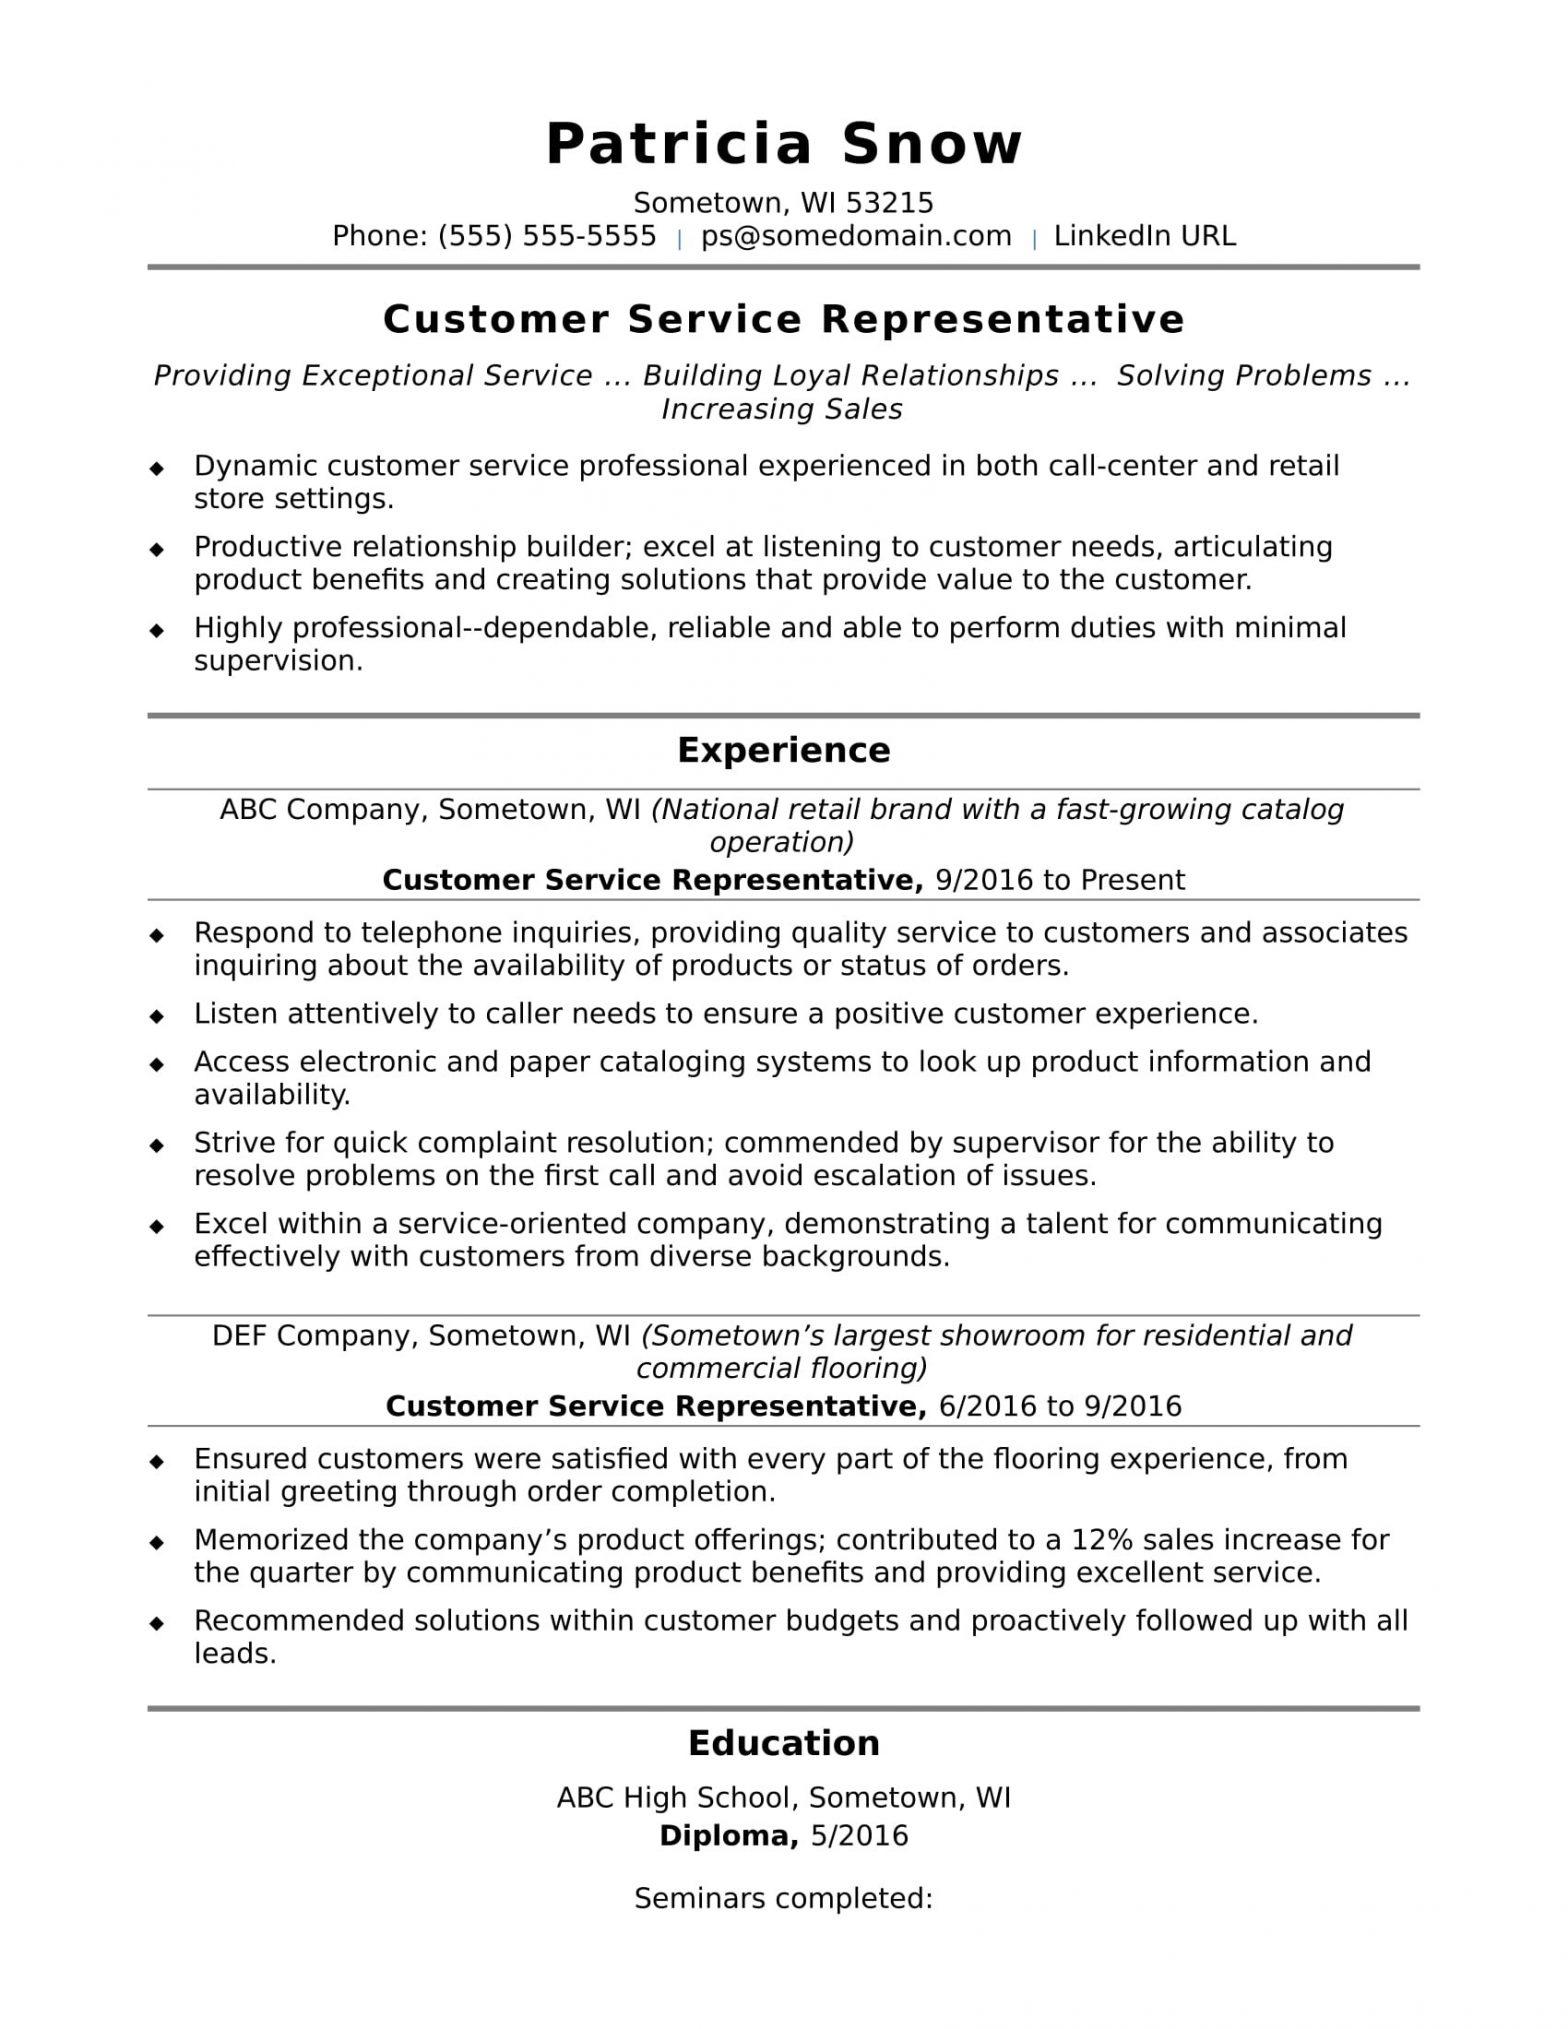 Sample Resume for Customer Service Position Customer Service Representative Resume Sample Monster.com